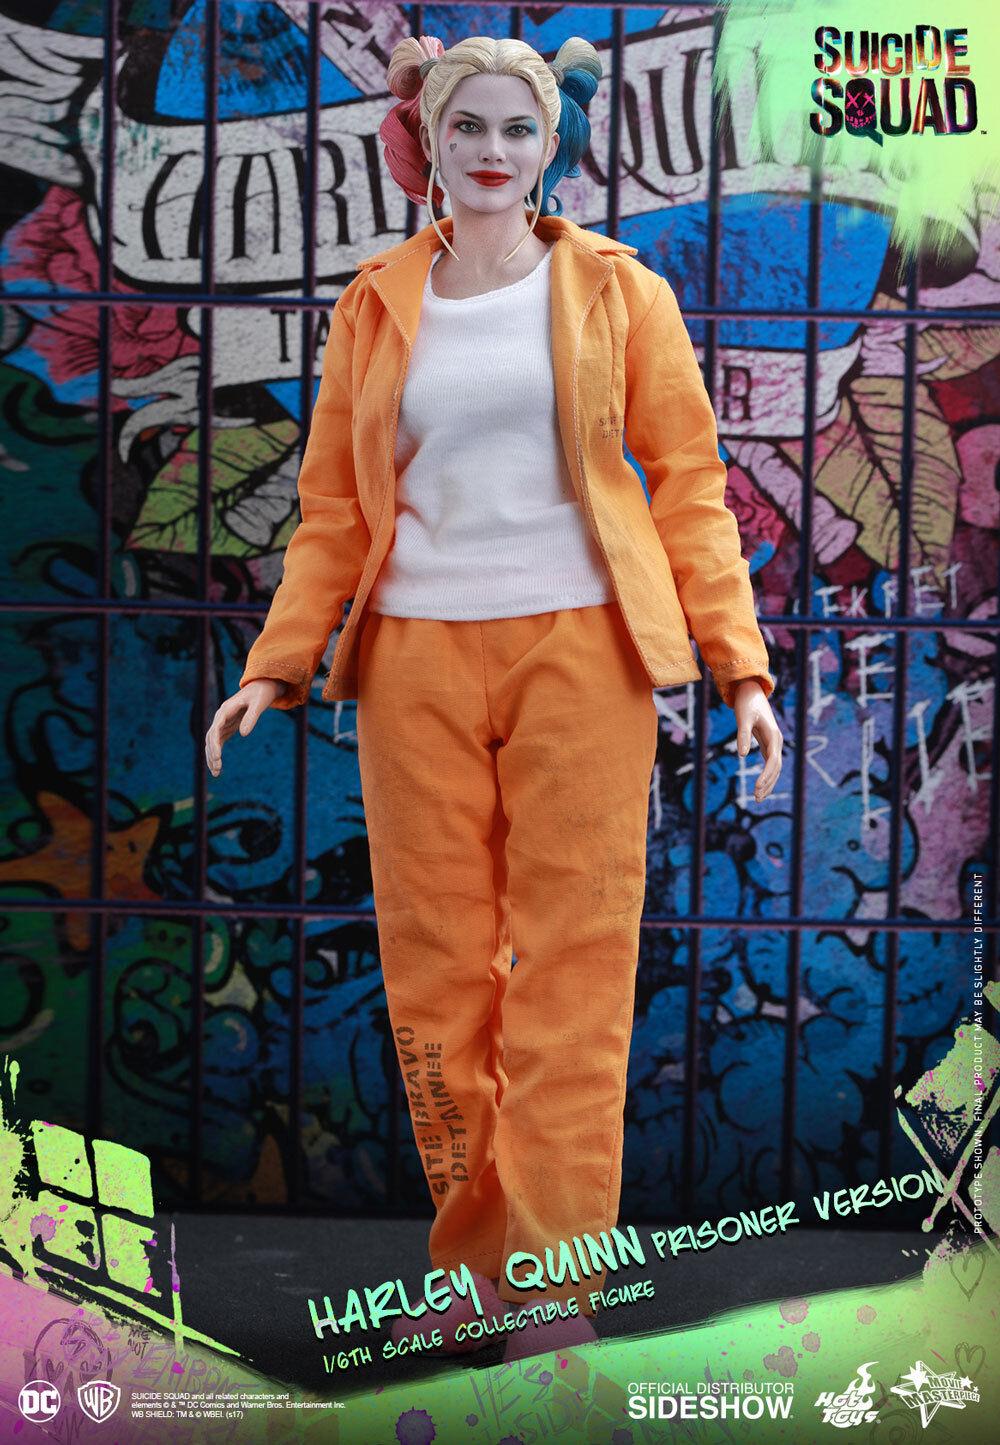 Suicide Squad 12 Inch Figure MMS - Harley Quinn Prisoner Version Hot Toys 902949